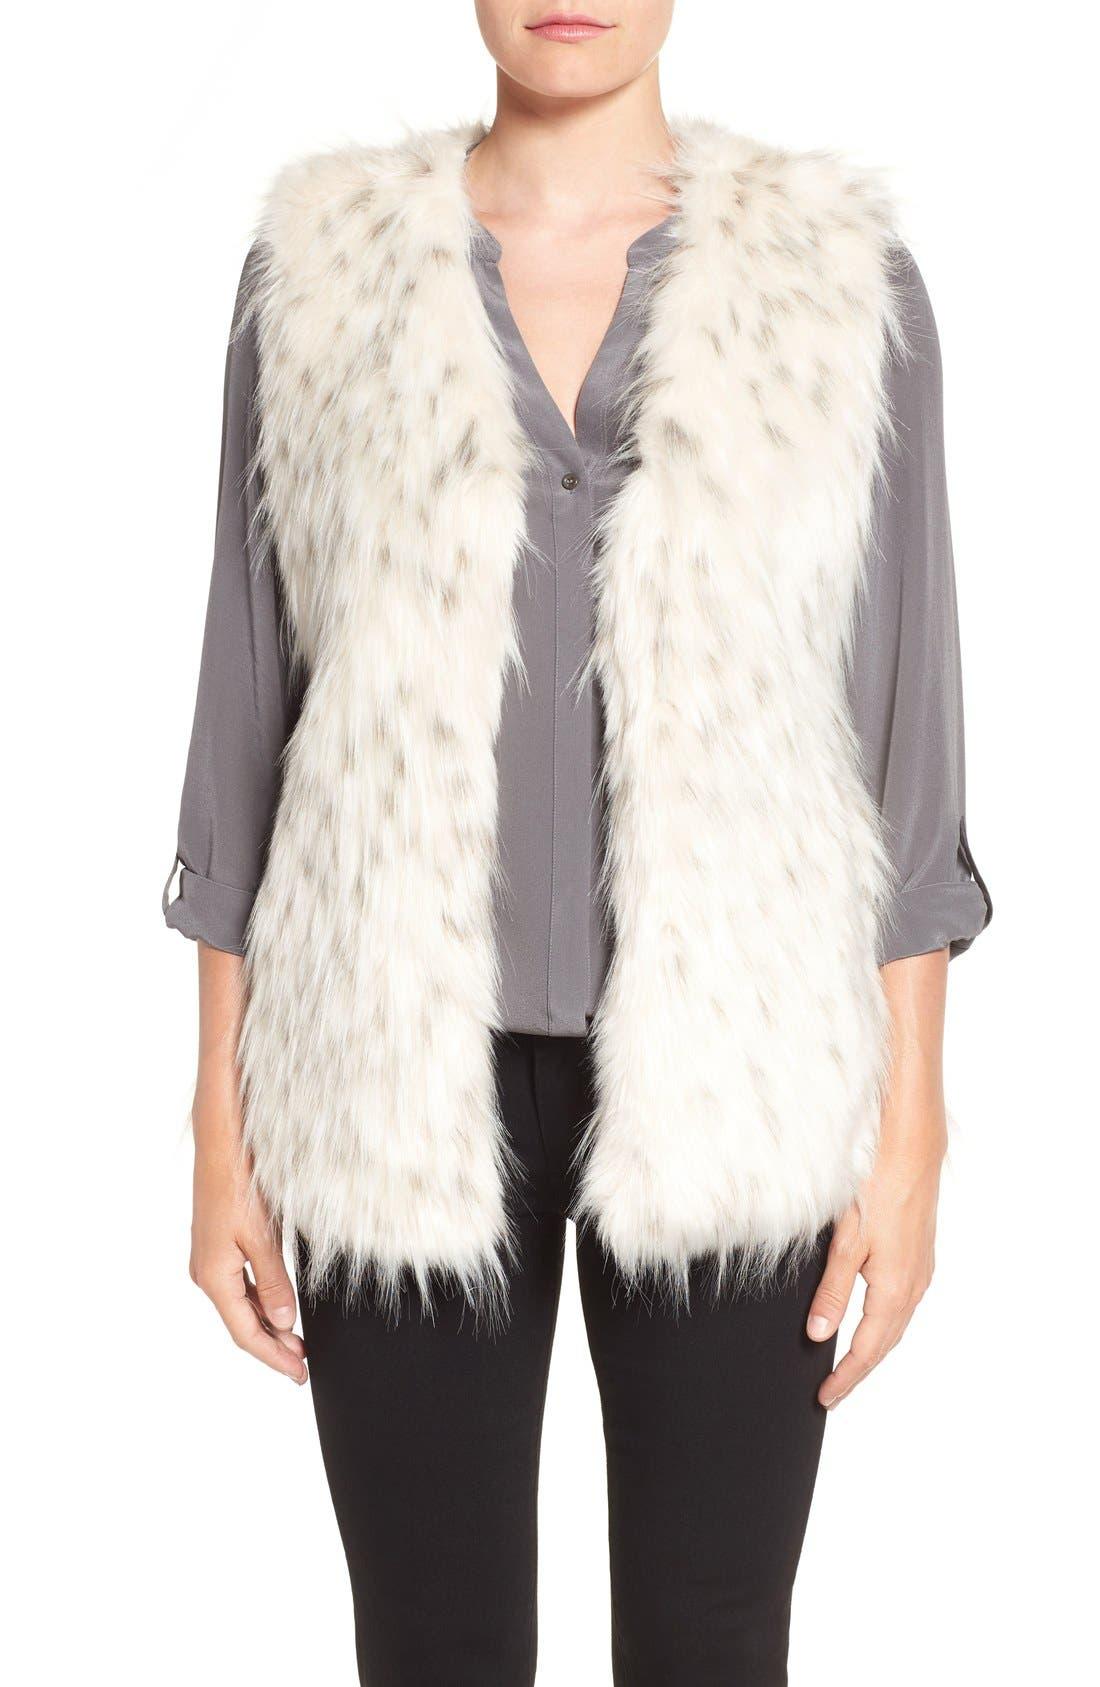 Alternate Image 1 Selected - Via Spiga Collarless Faux Fur Vest